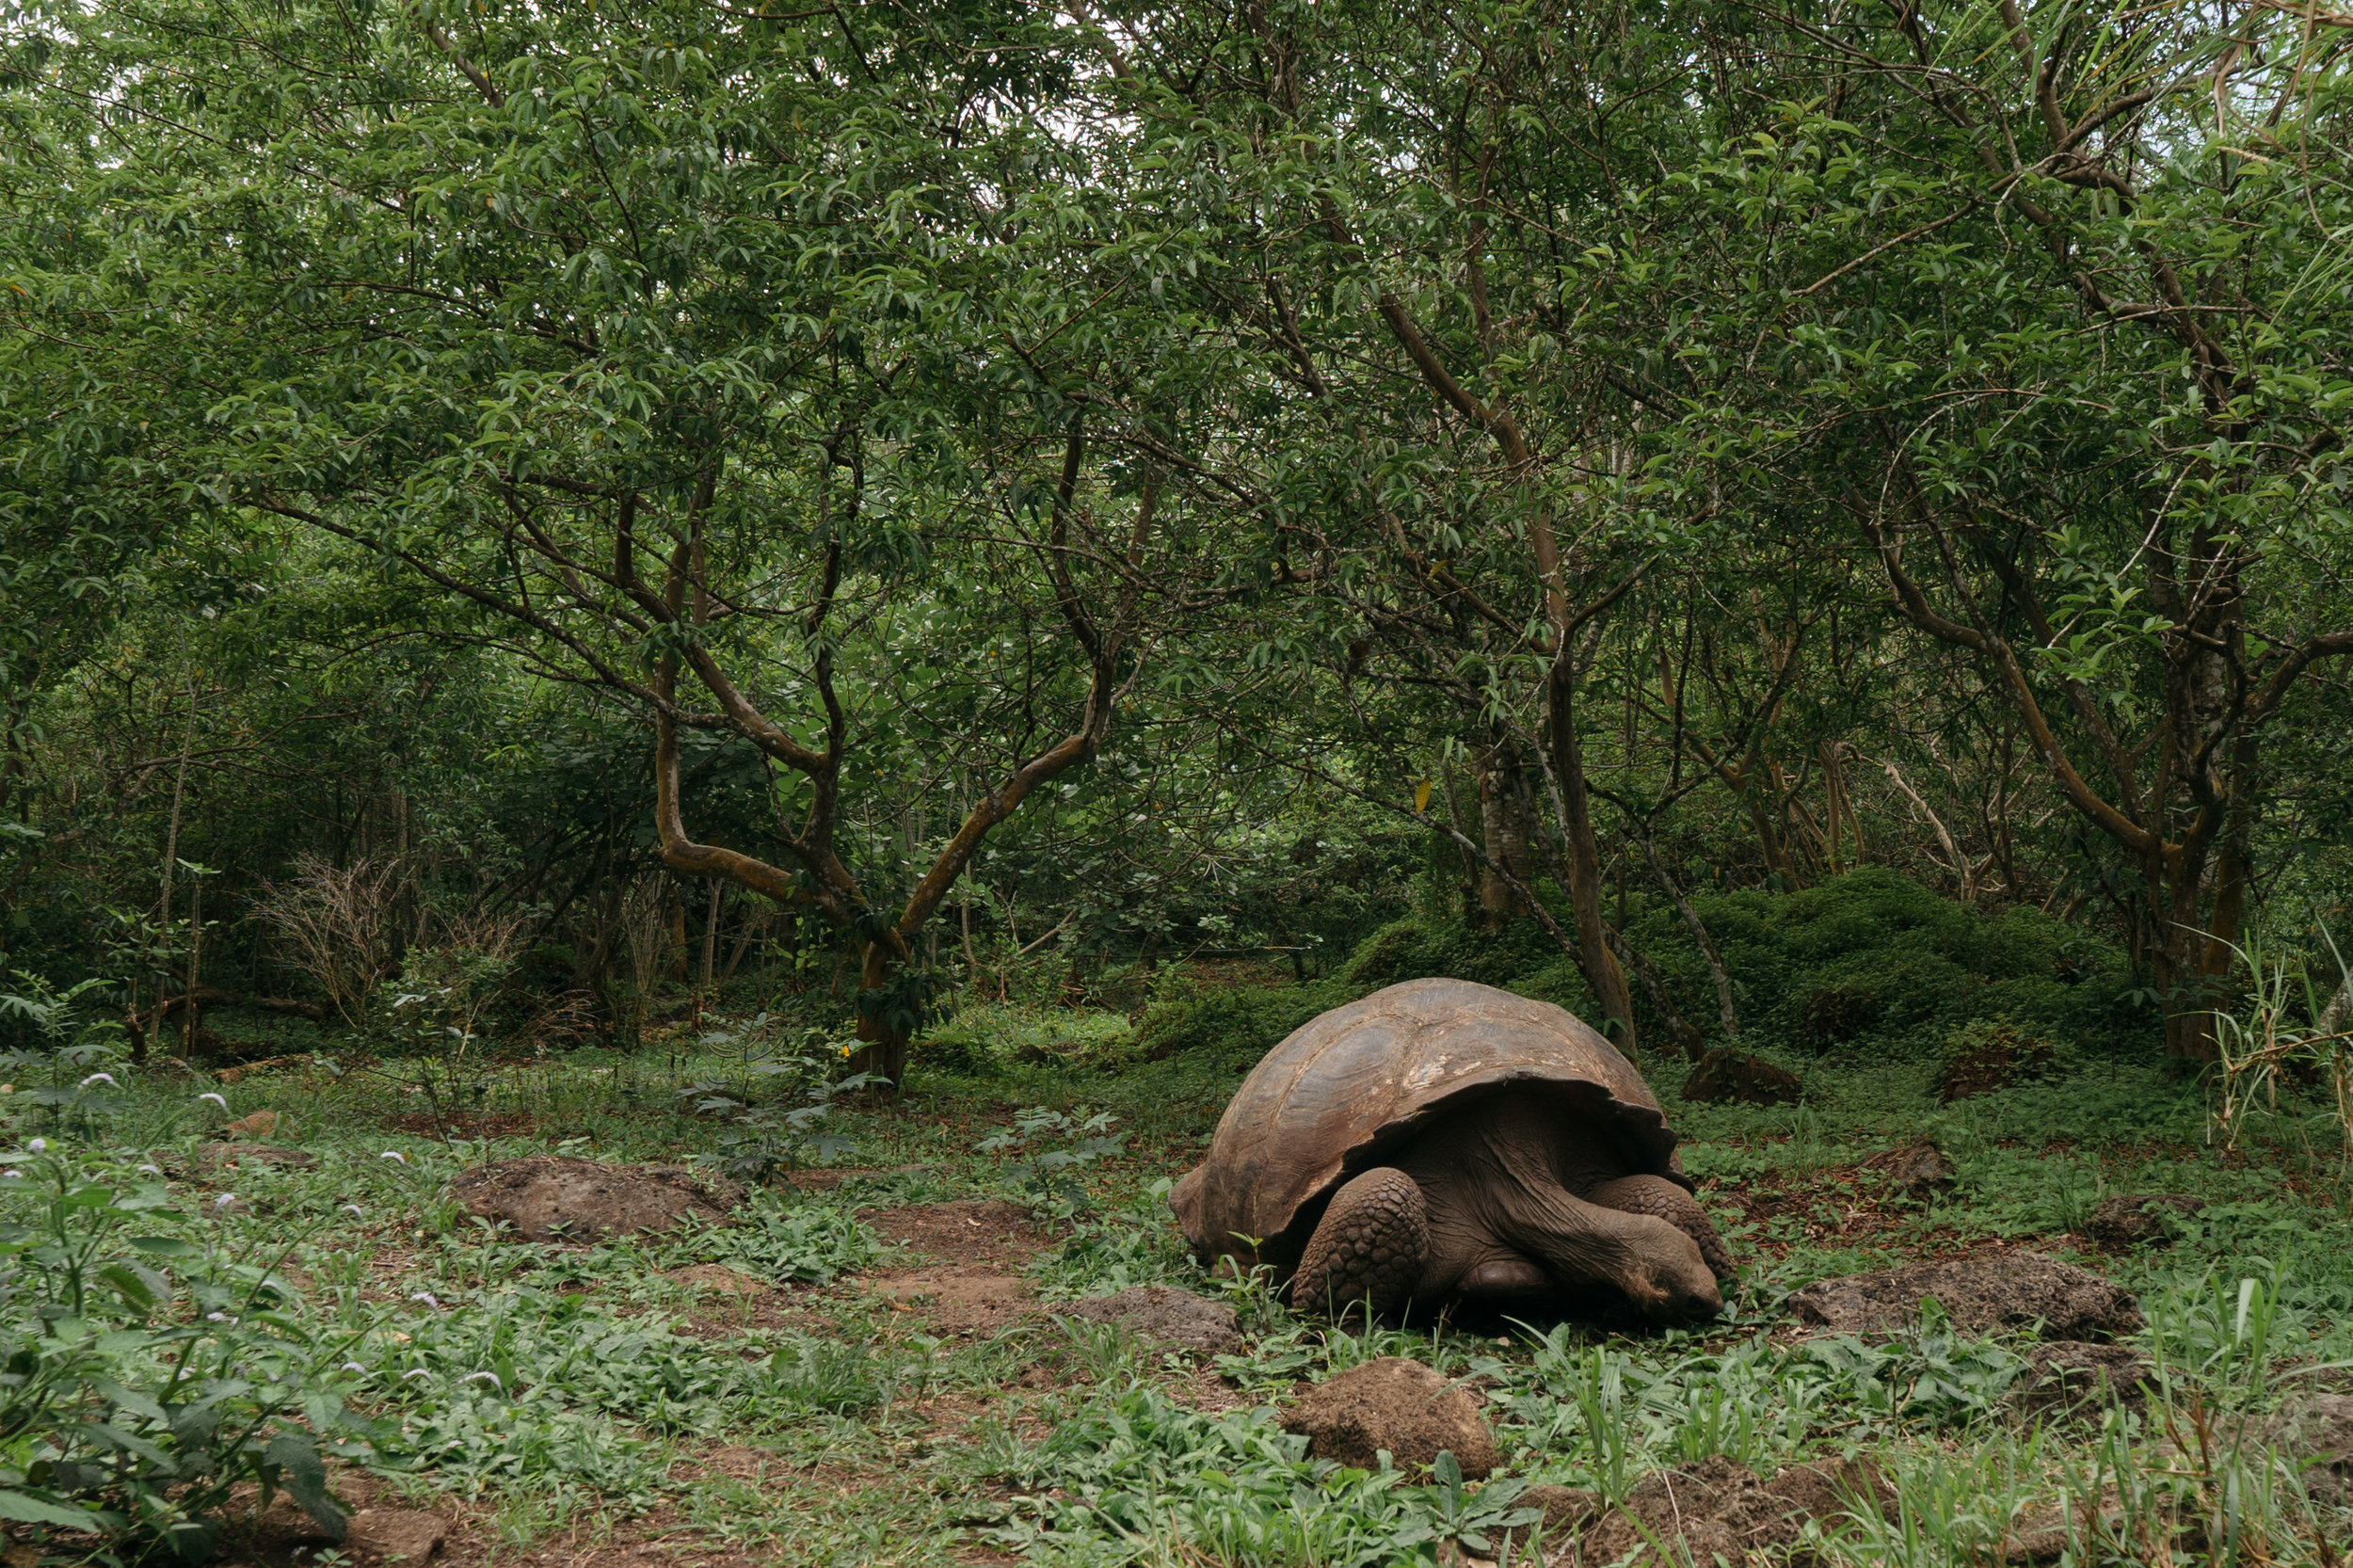 Giant Santa Cruz Tortoise - El Chato